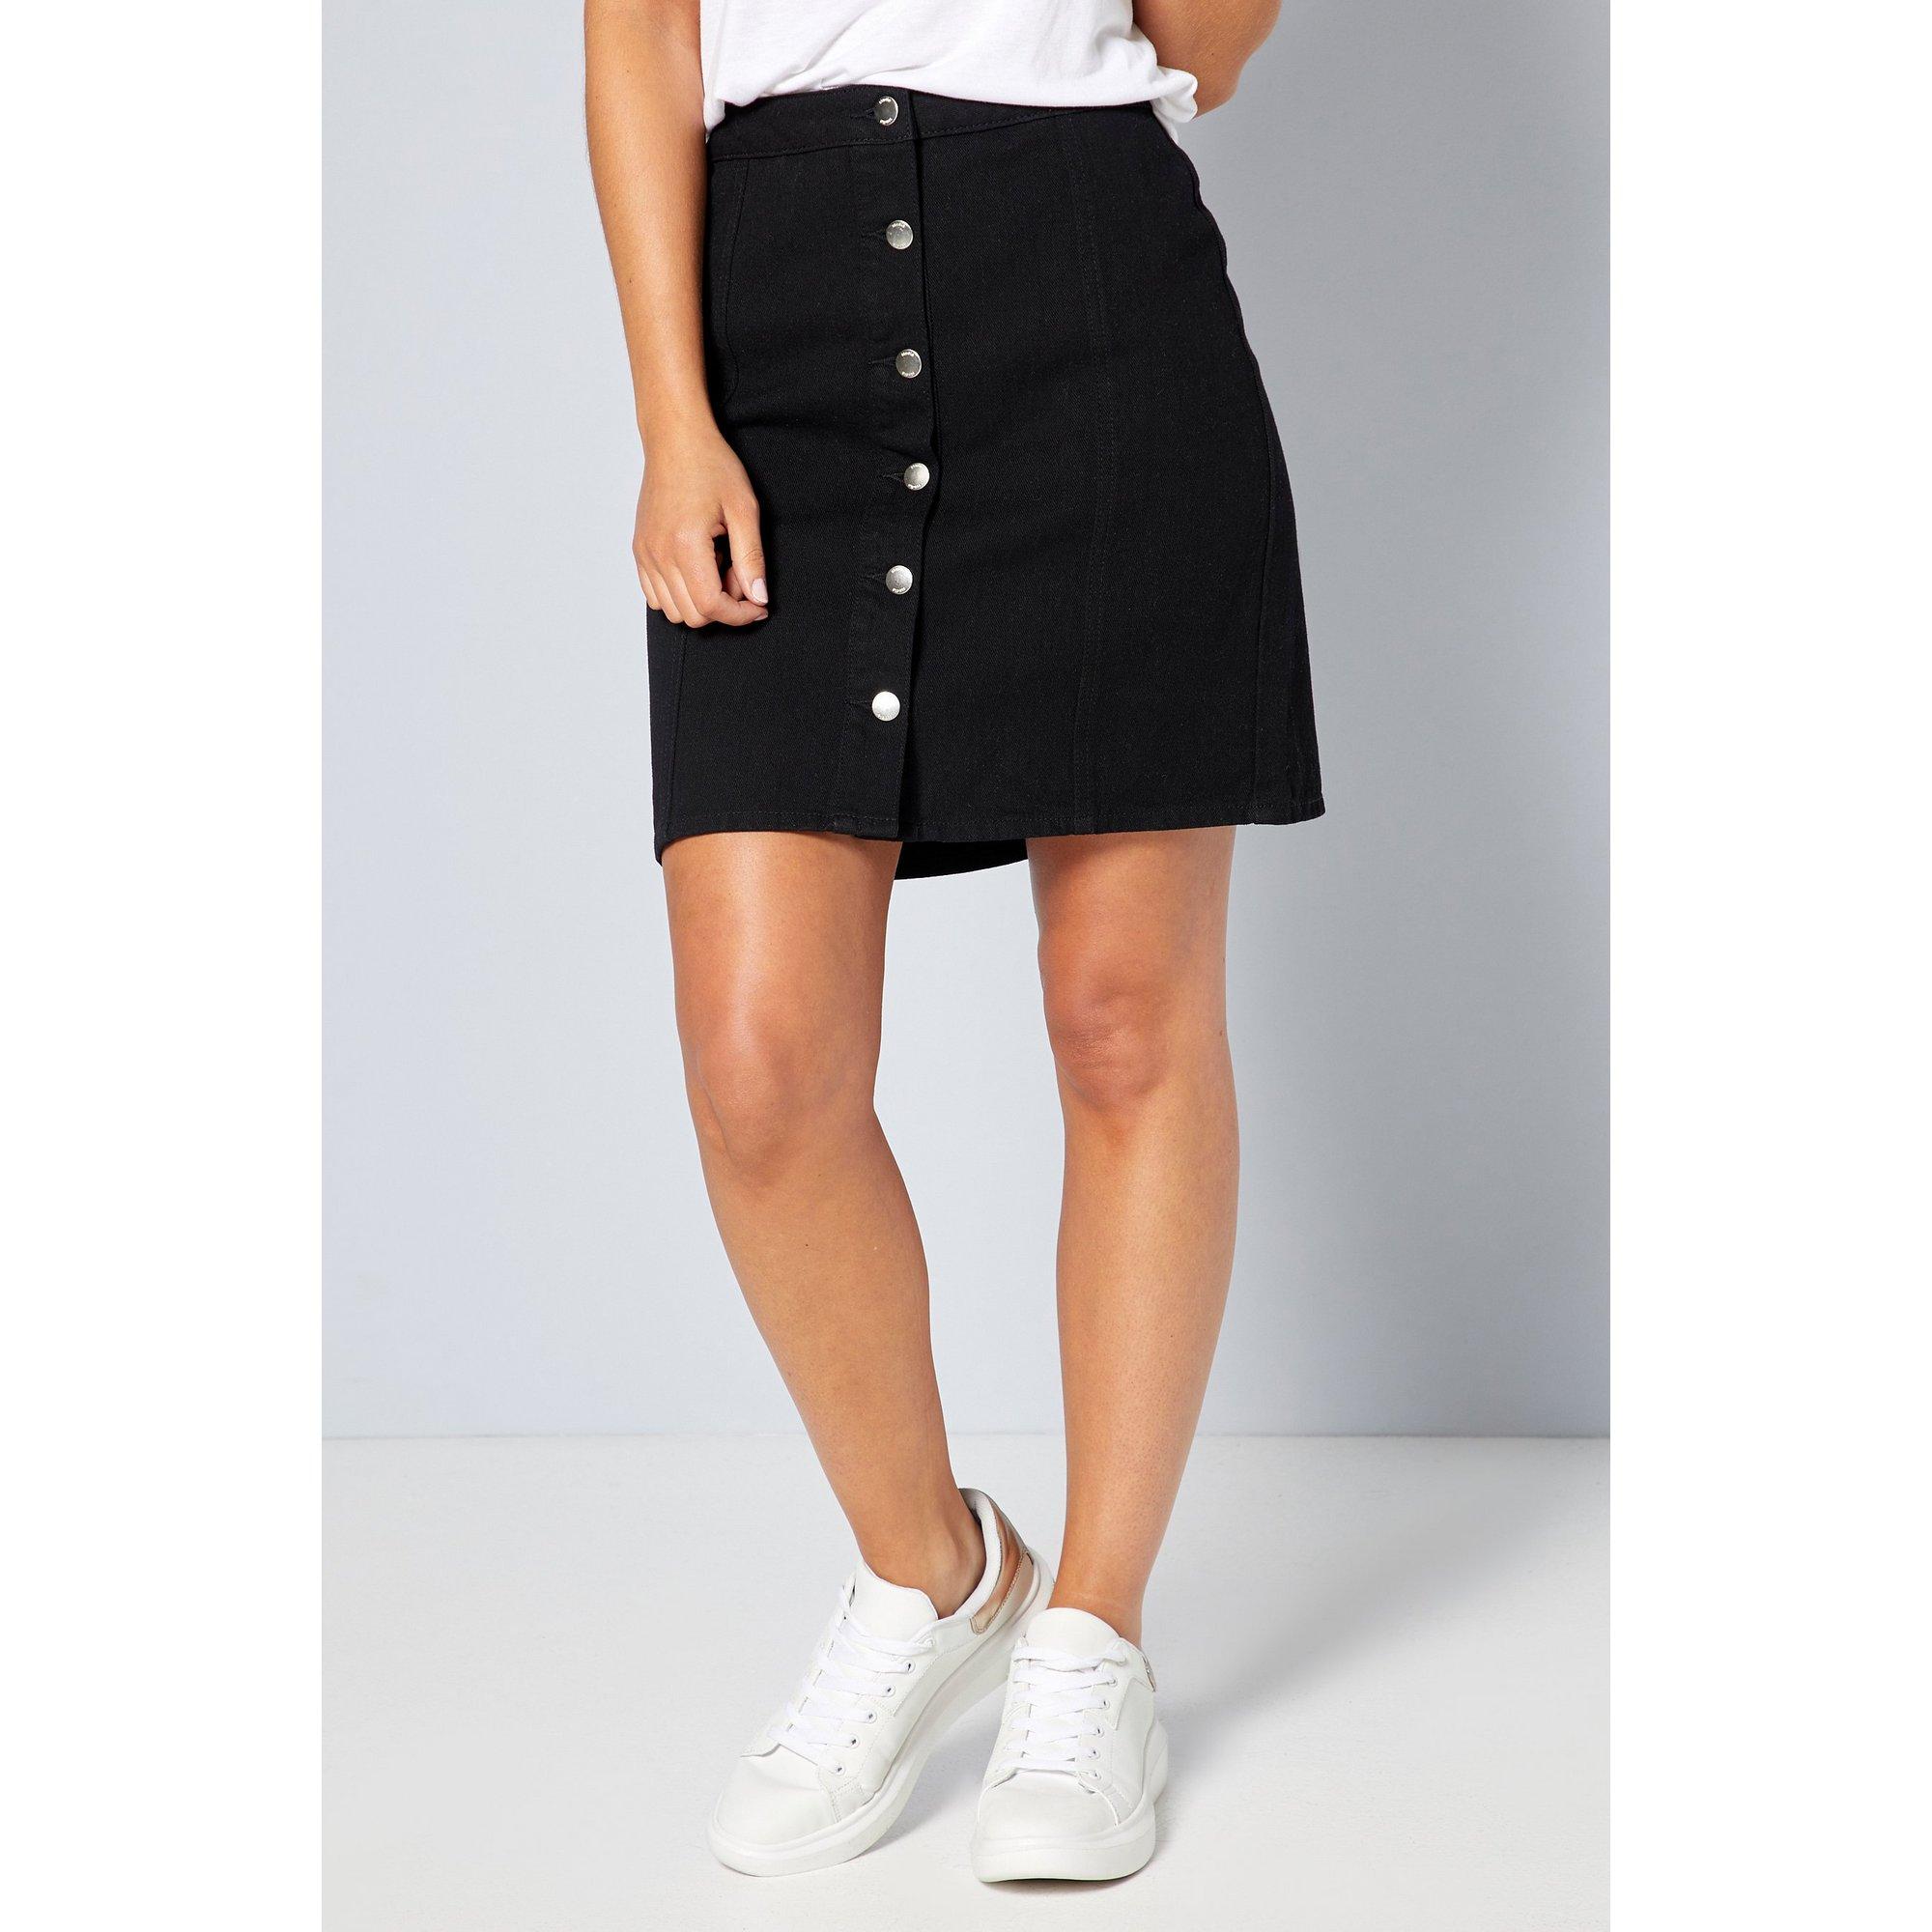 Image of Basic Black Denim Button Through Skirt